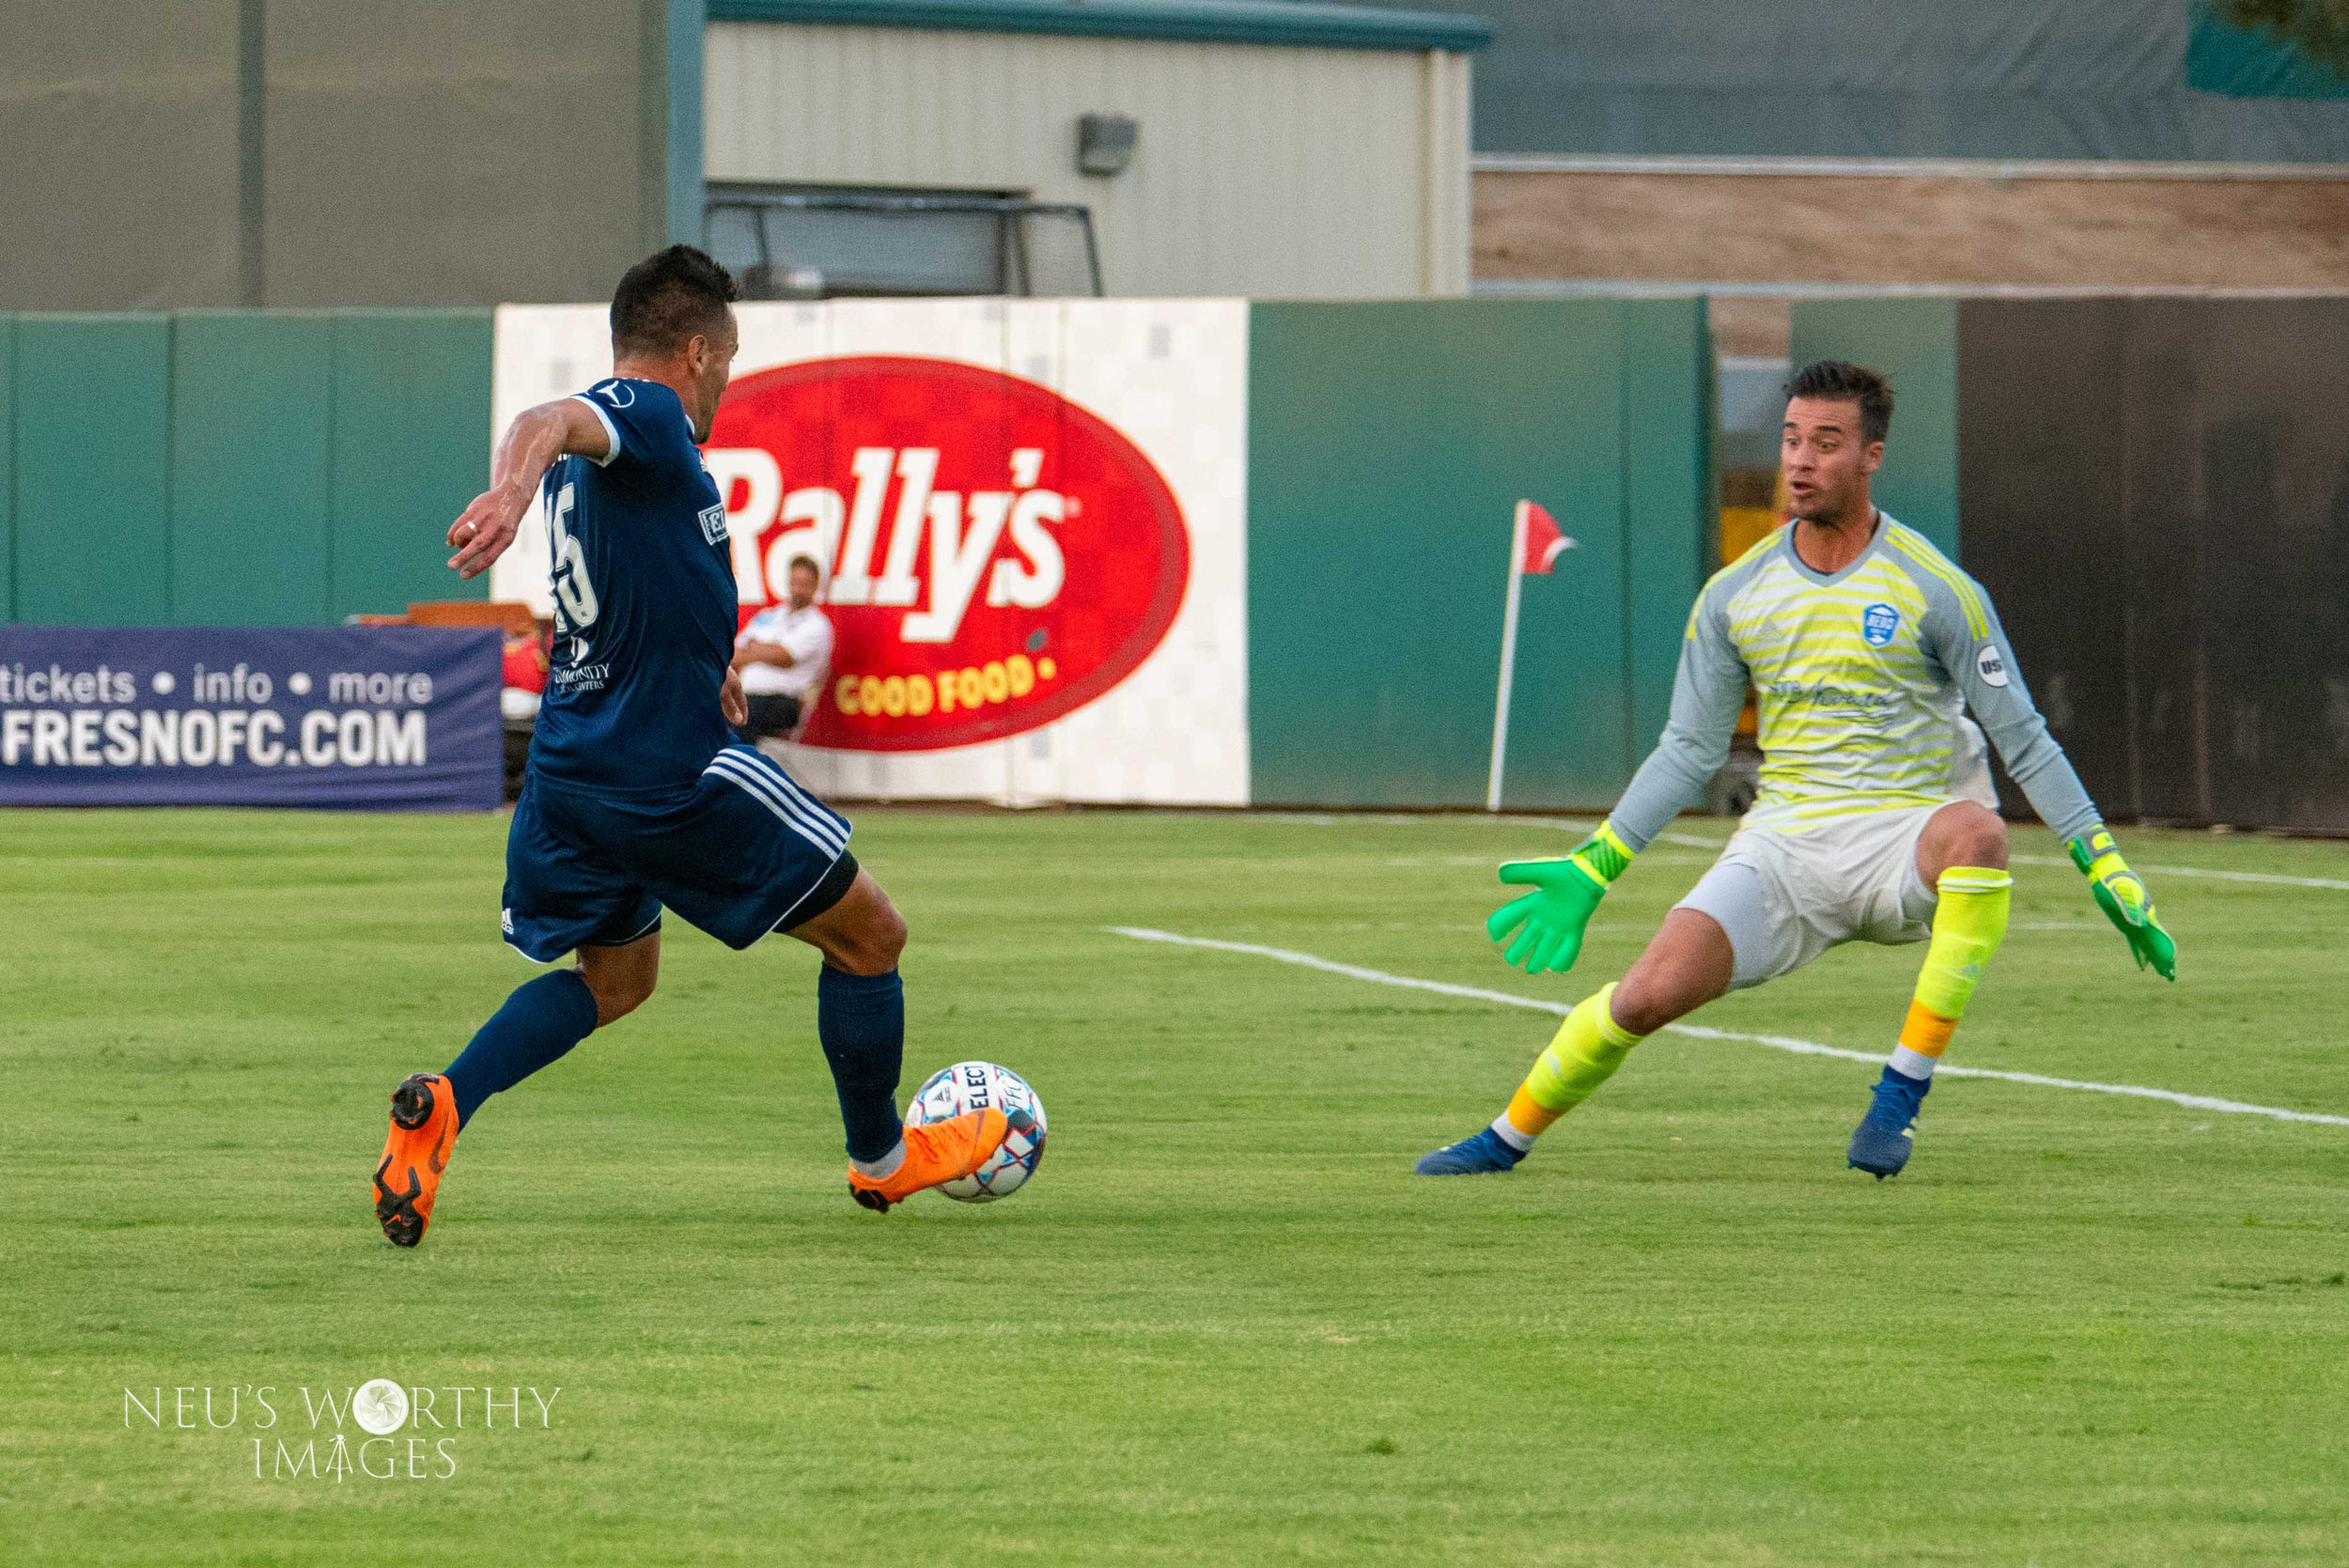 Fresno FC 090118-15.jpg